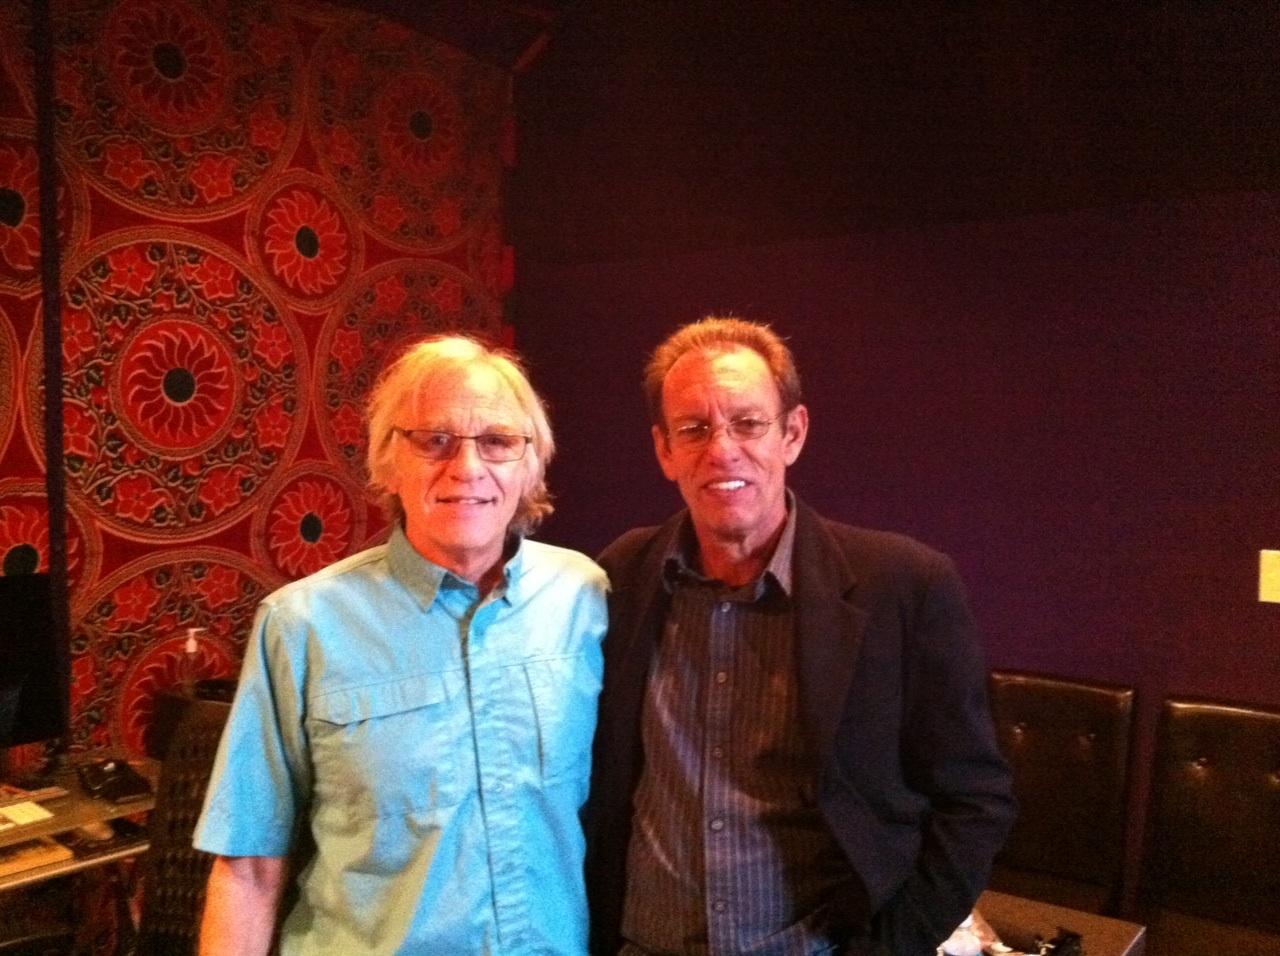 Gary Belz and Jack Holder